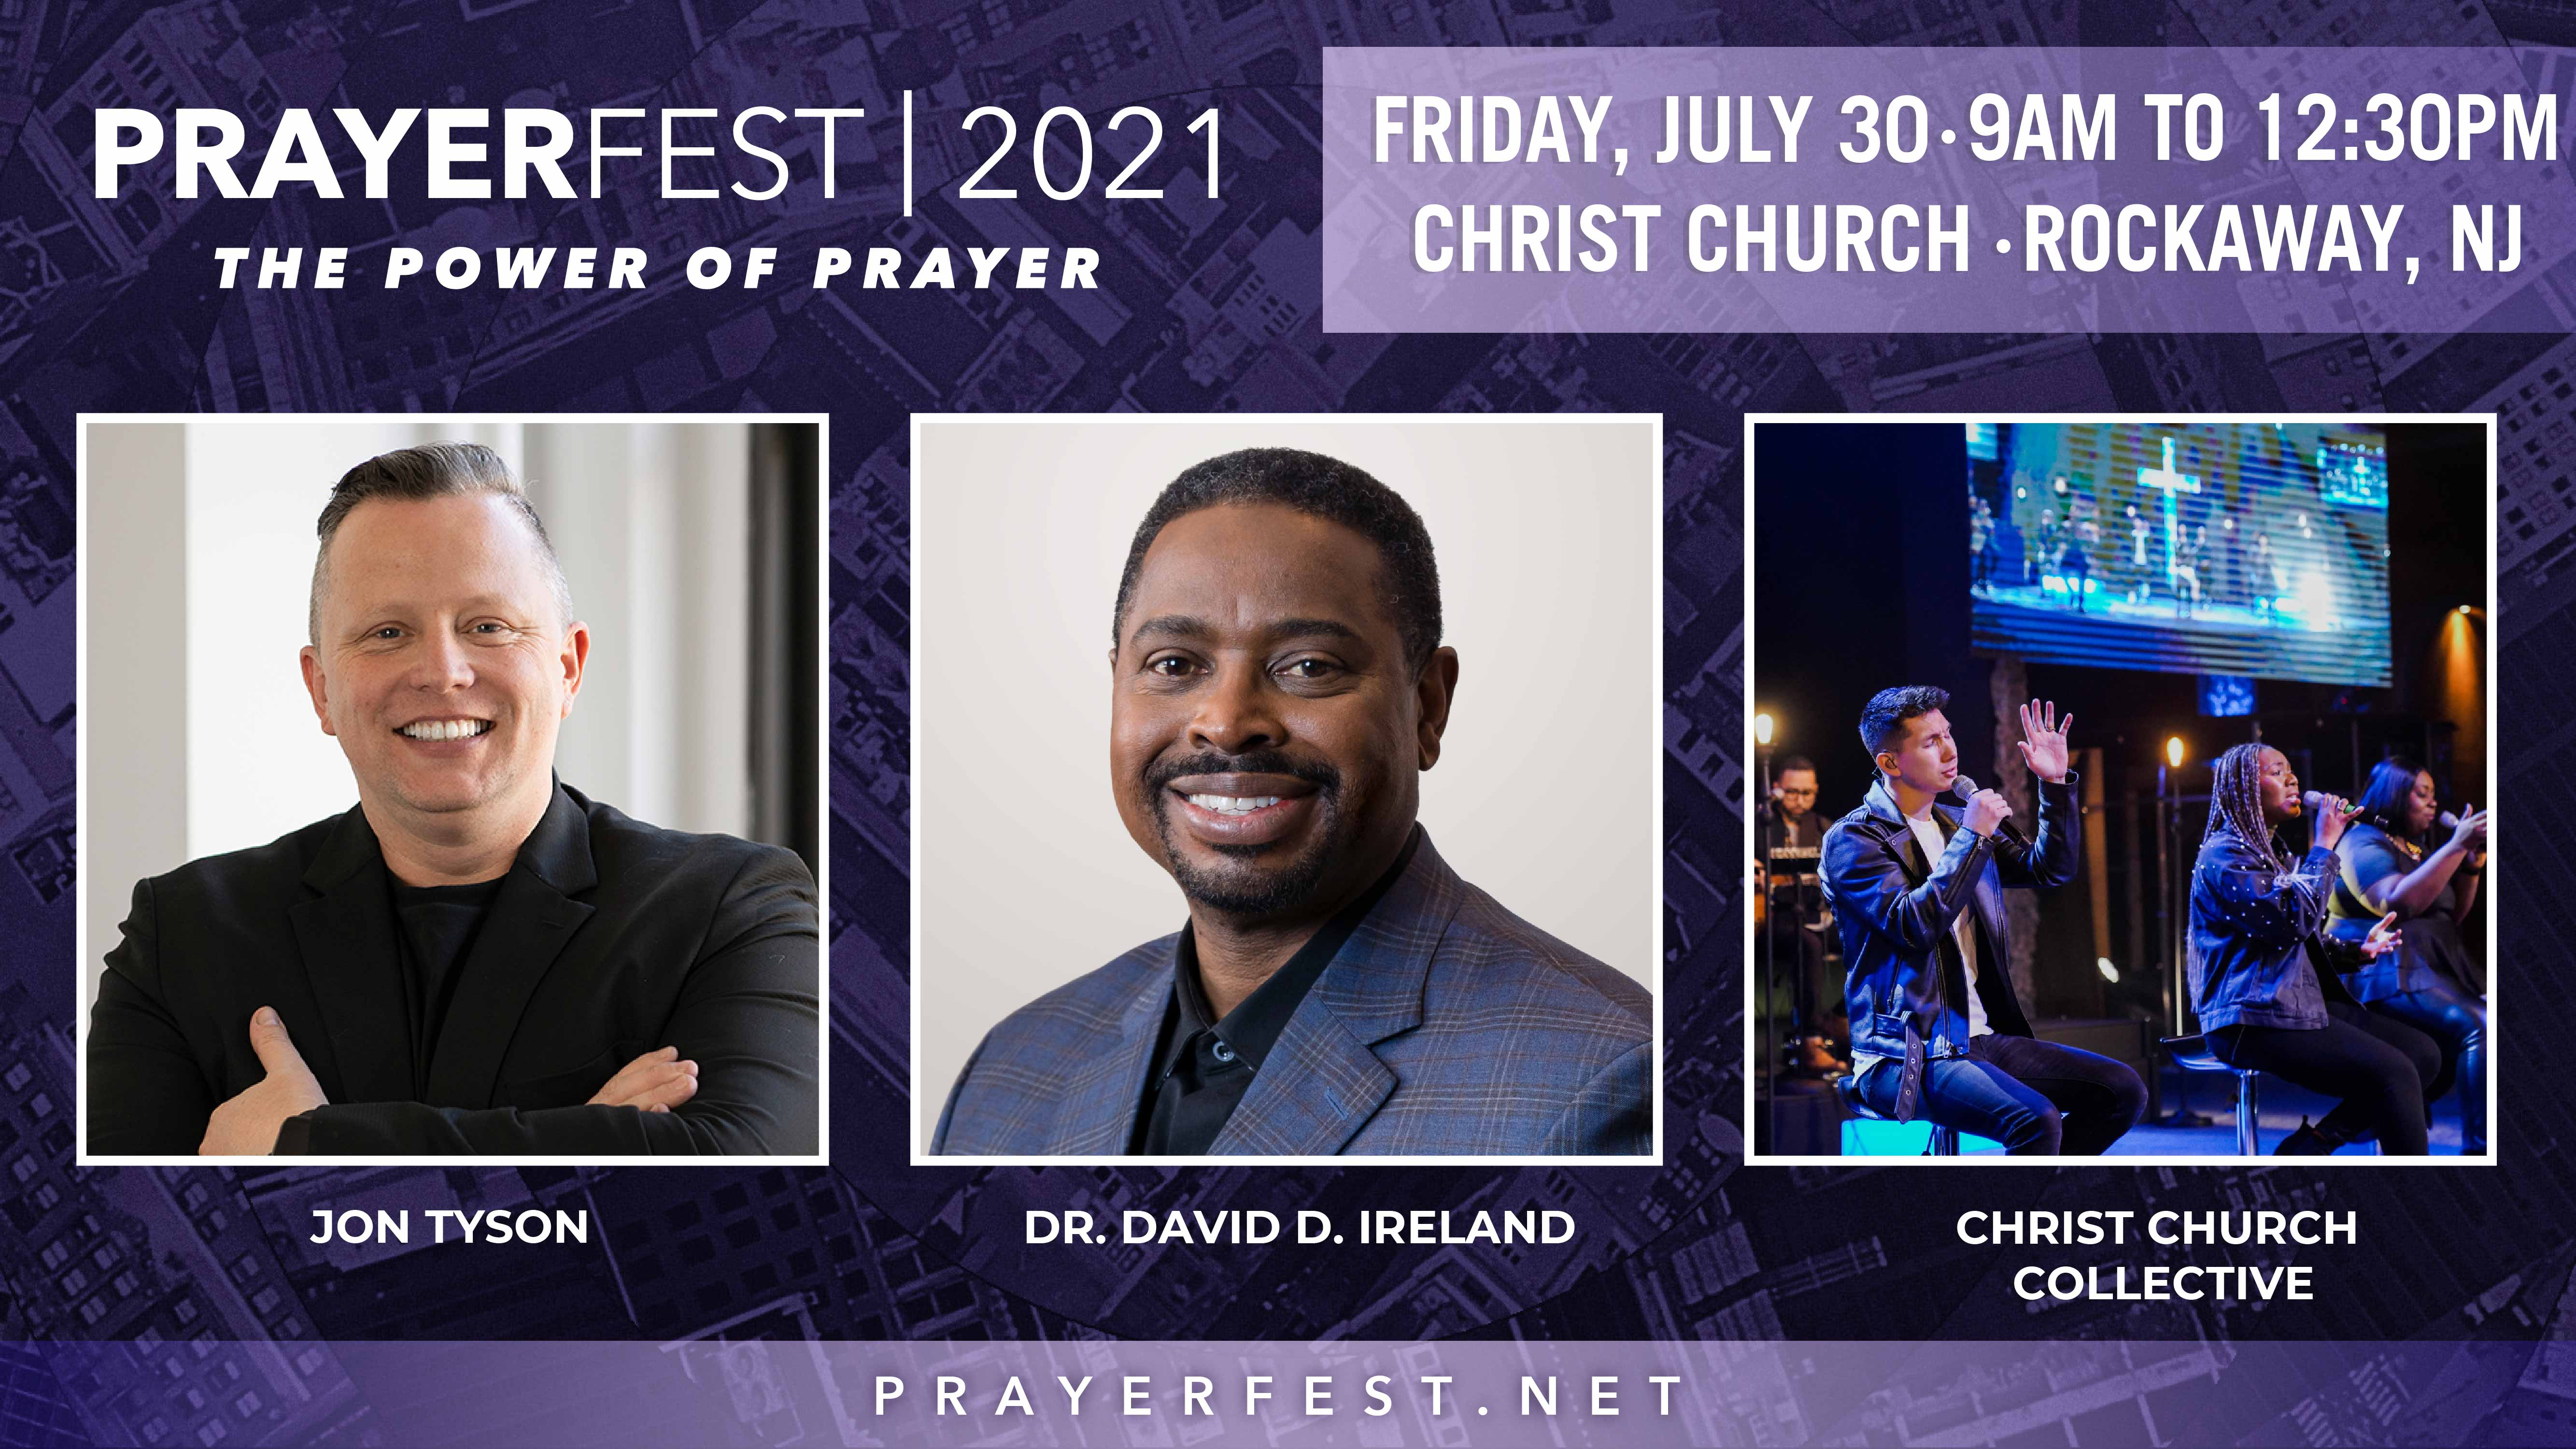 Christ Church Prepares to Host Prayerfest 2021